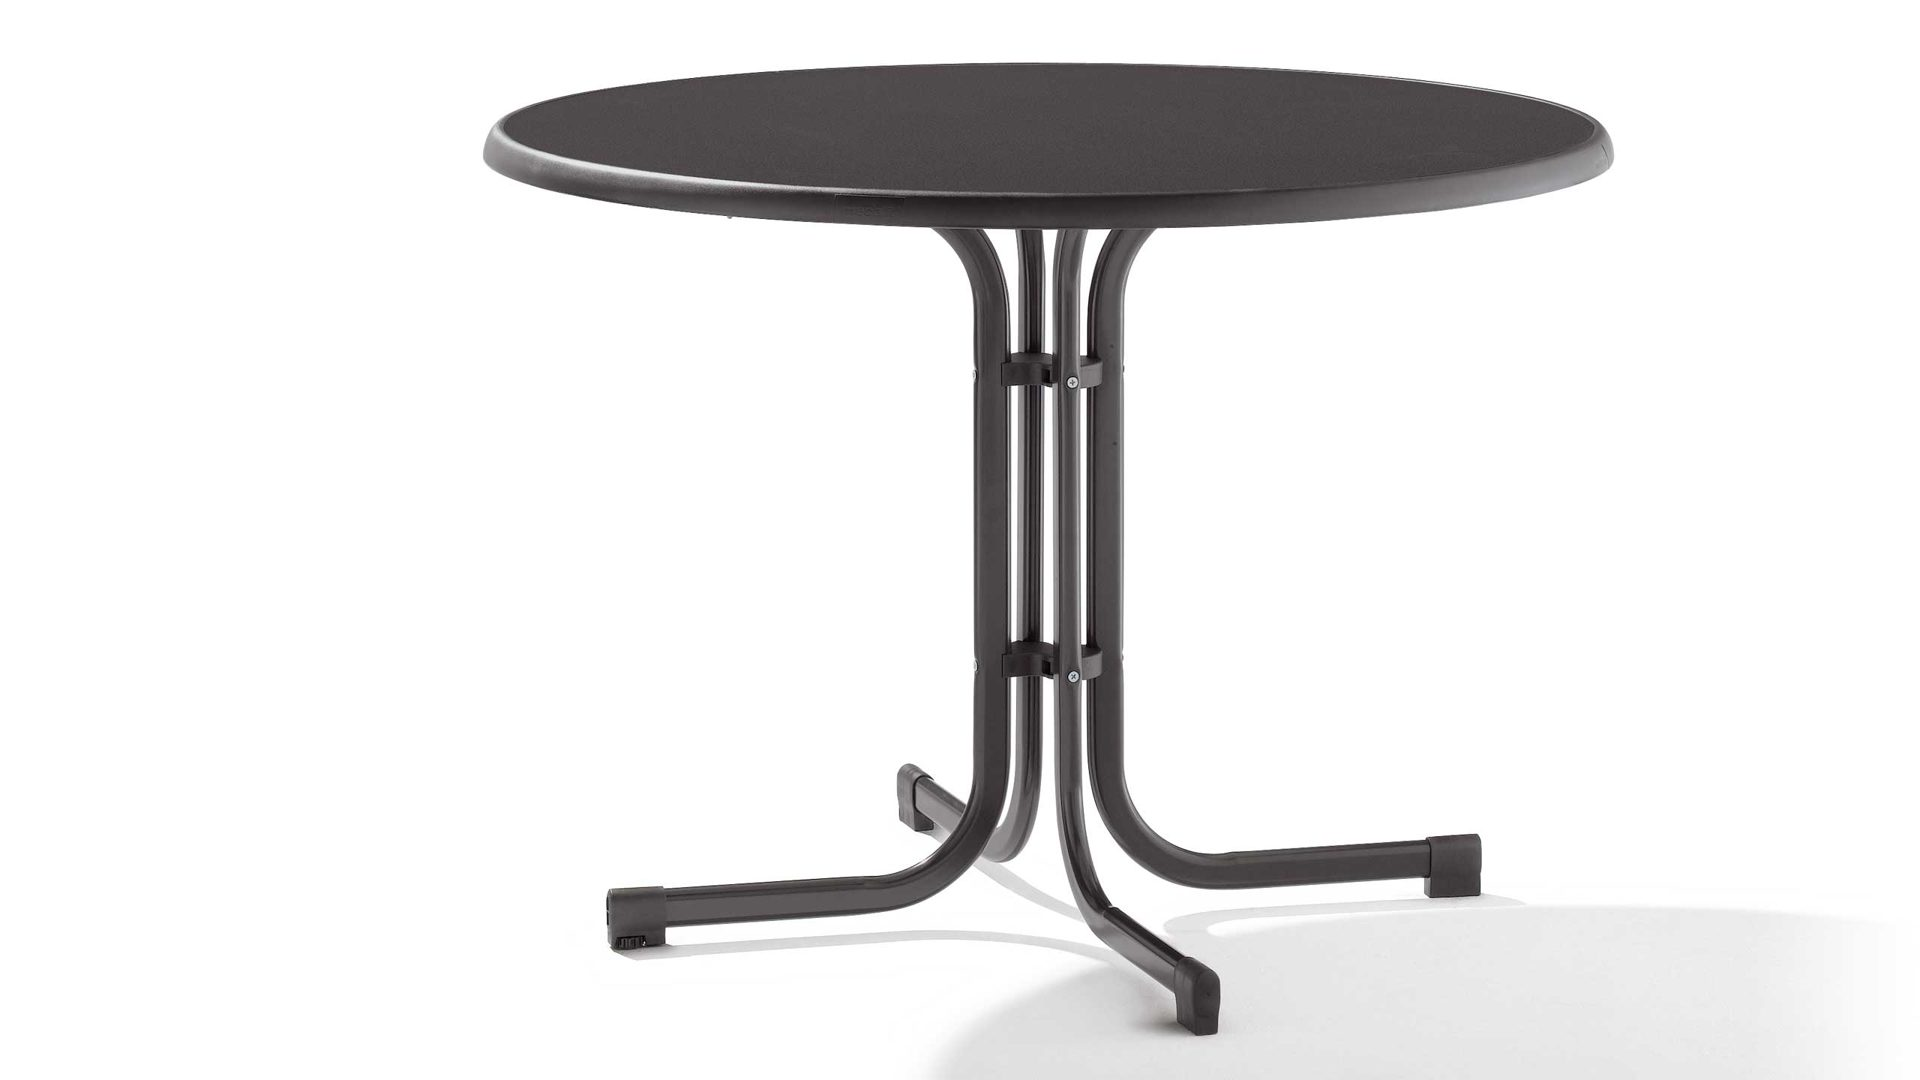 Sieger Klapptisch Gartentisch Tischplatte Mecalit D 100 Cm